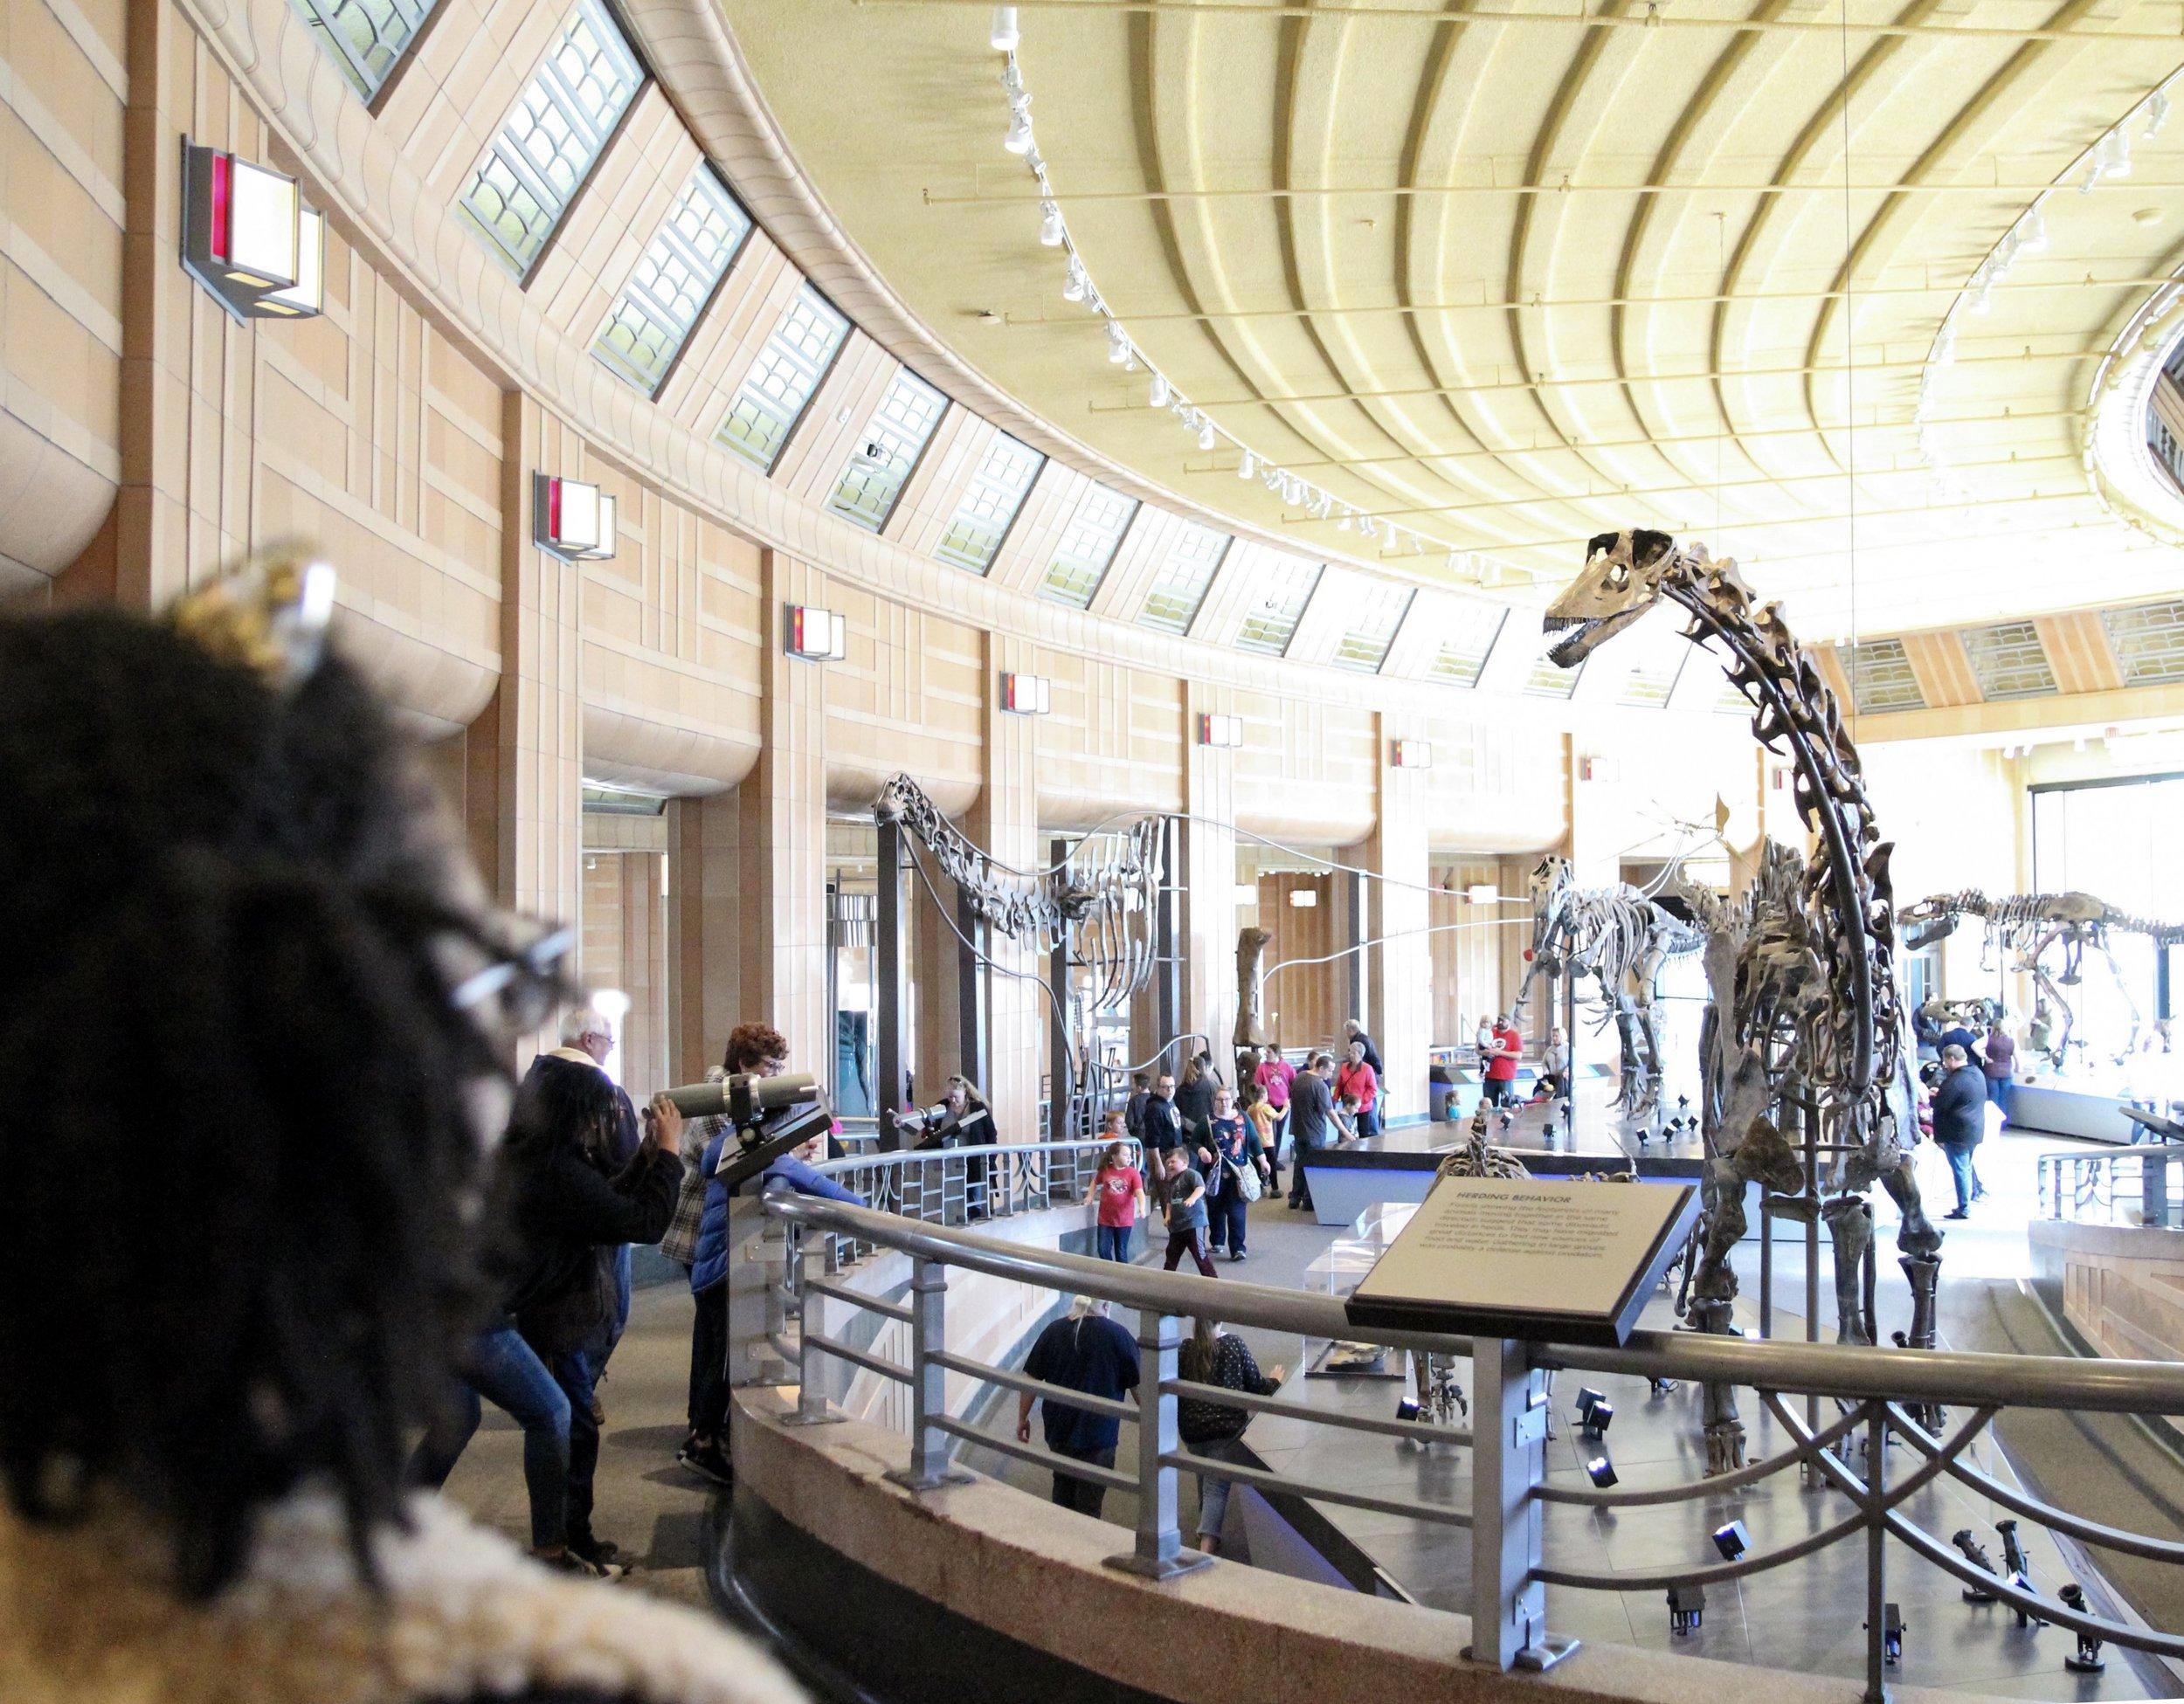 cincinnati museum of natural history and science.jpeg